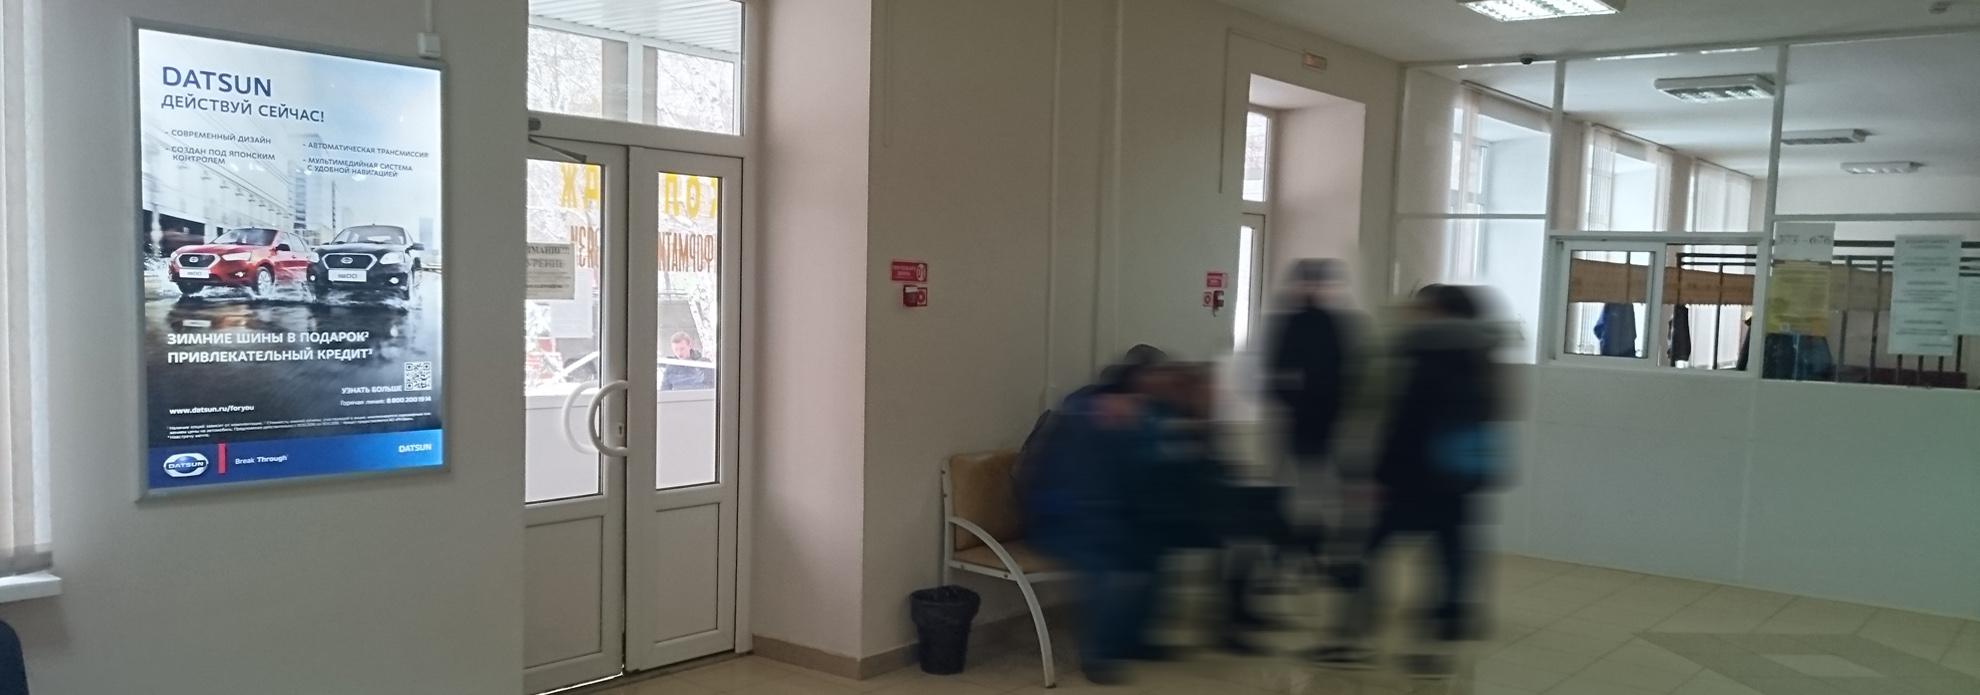 indoor-reklama-institute-tyumen_tiu_tgngu_tmn_50-let-oktyabrya-ul-62